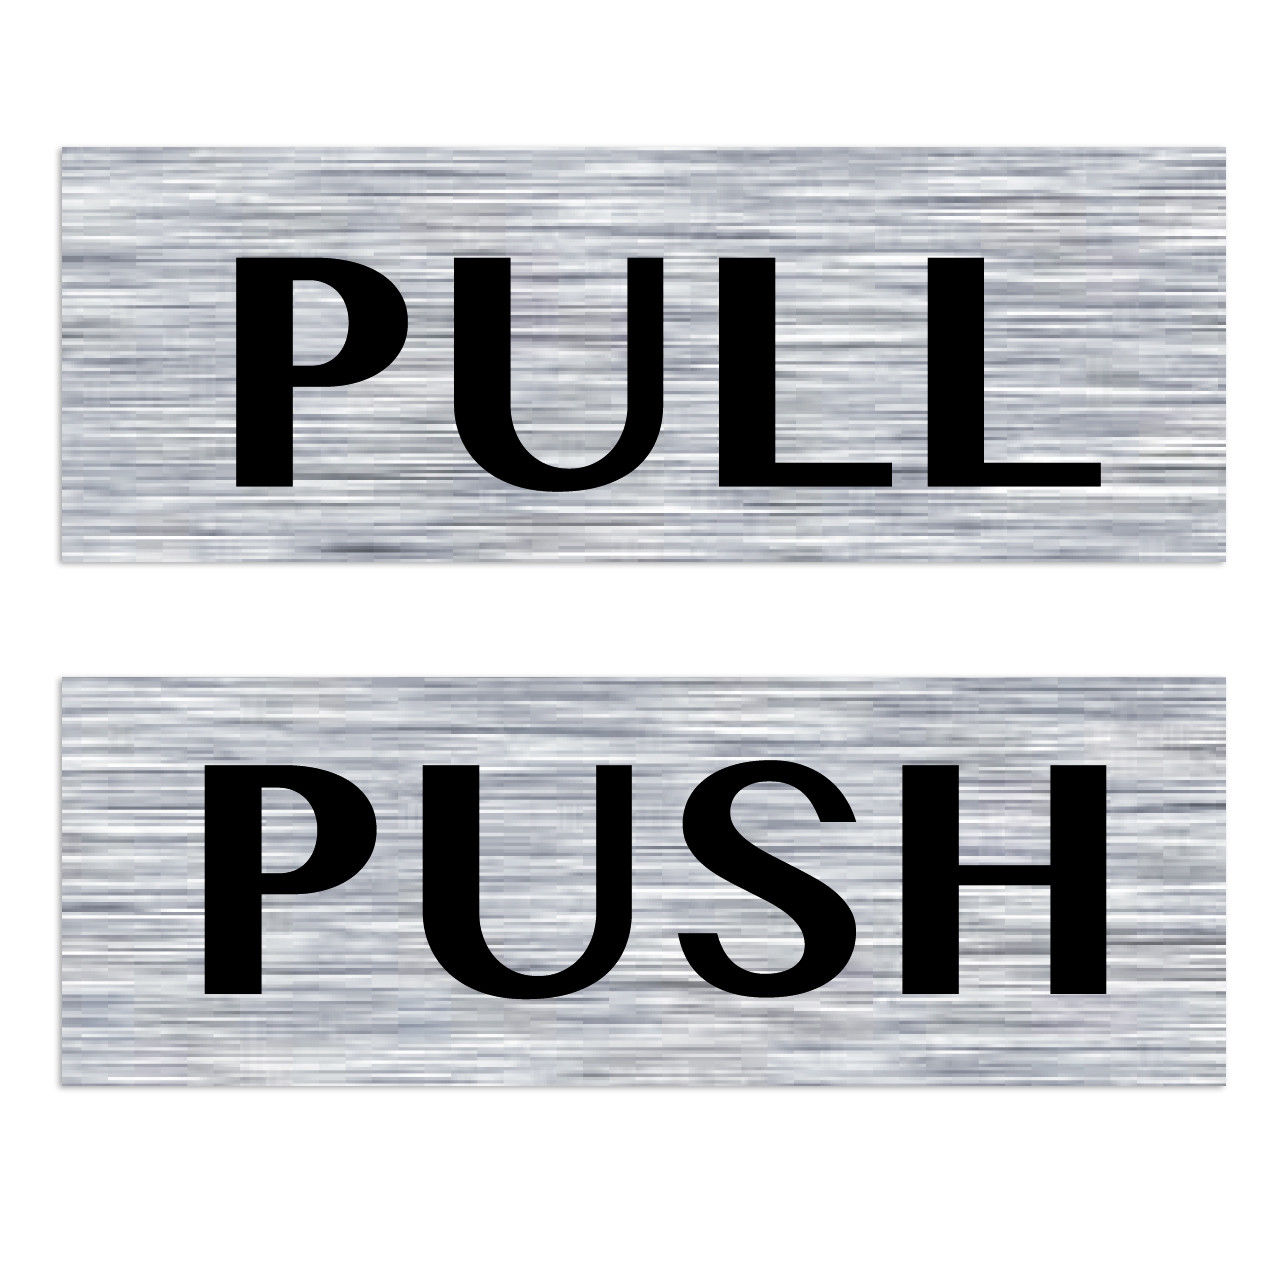 Pull Door Sticker Amp Image Is Loading 1pair Horizontal Push